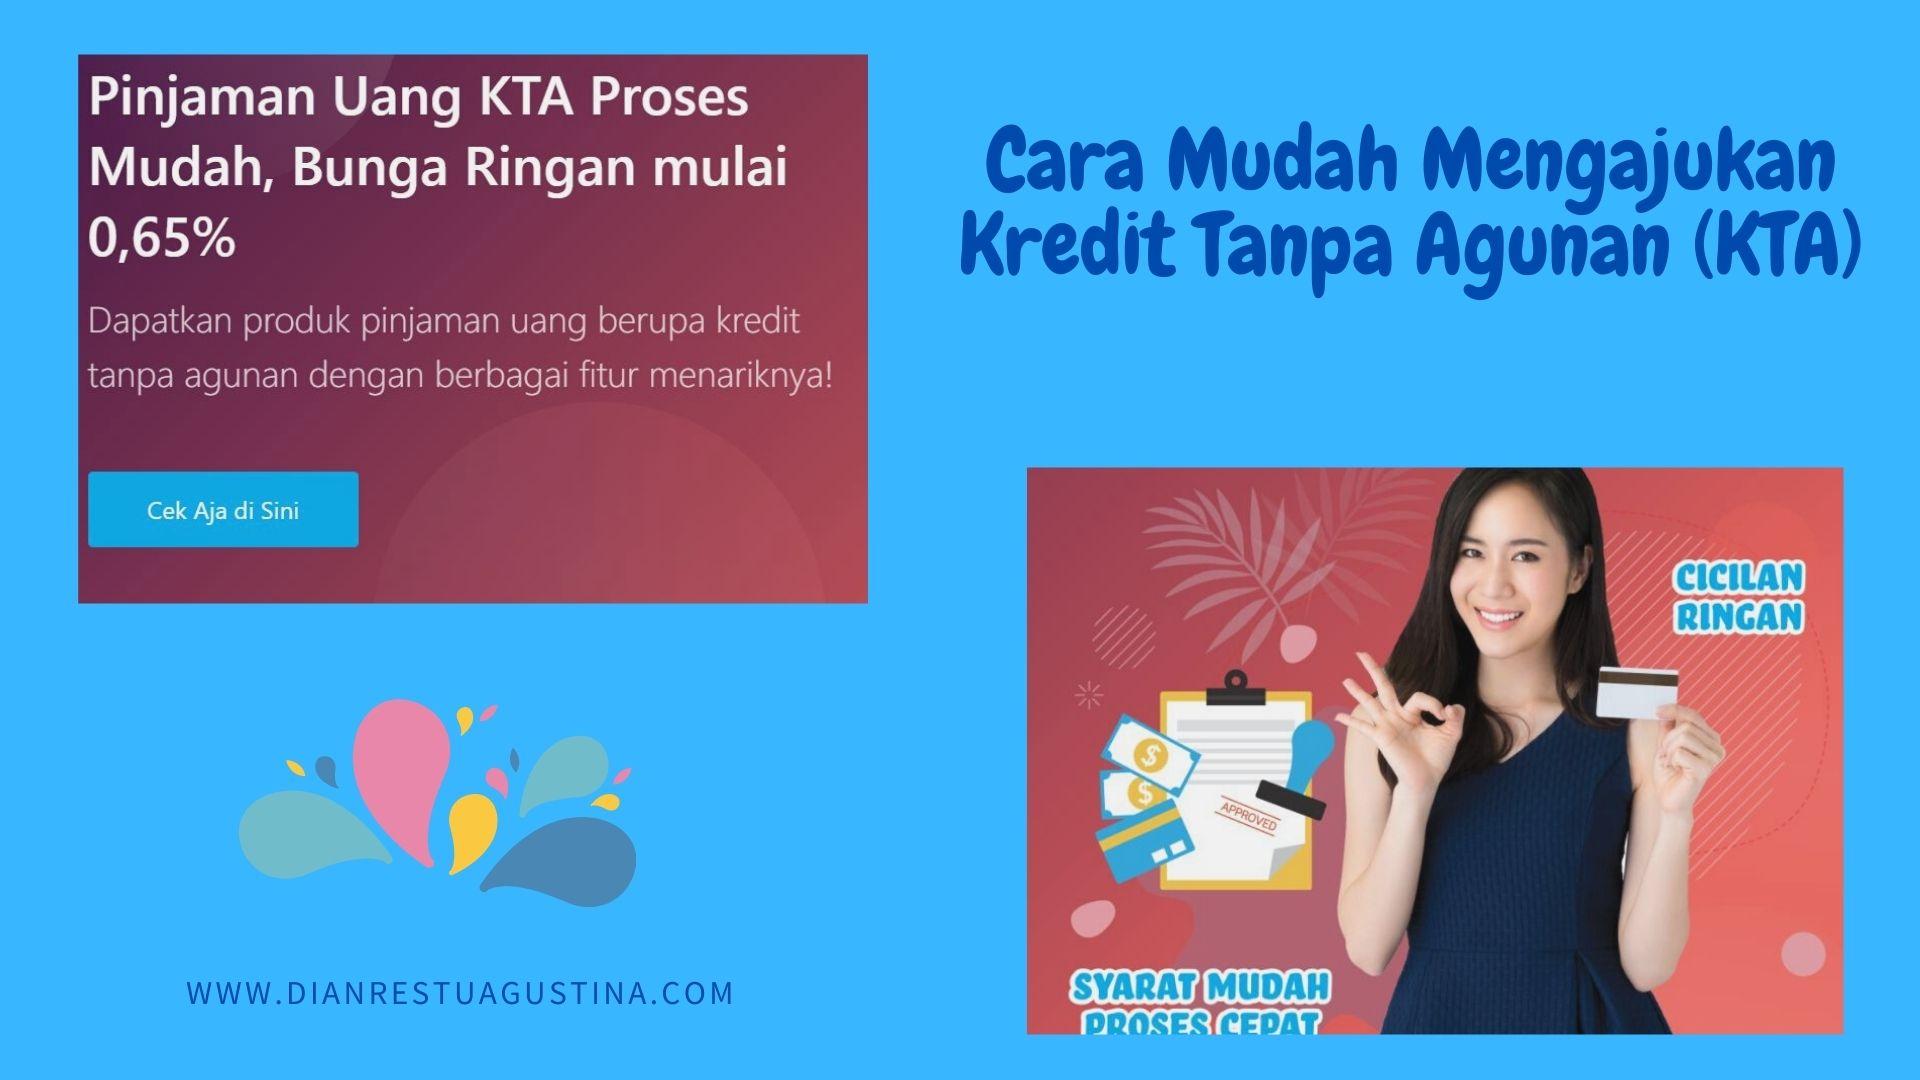 Cara Mudah Mengajukan Kredit Tanpa Agunan (KTA)